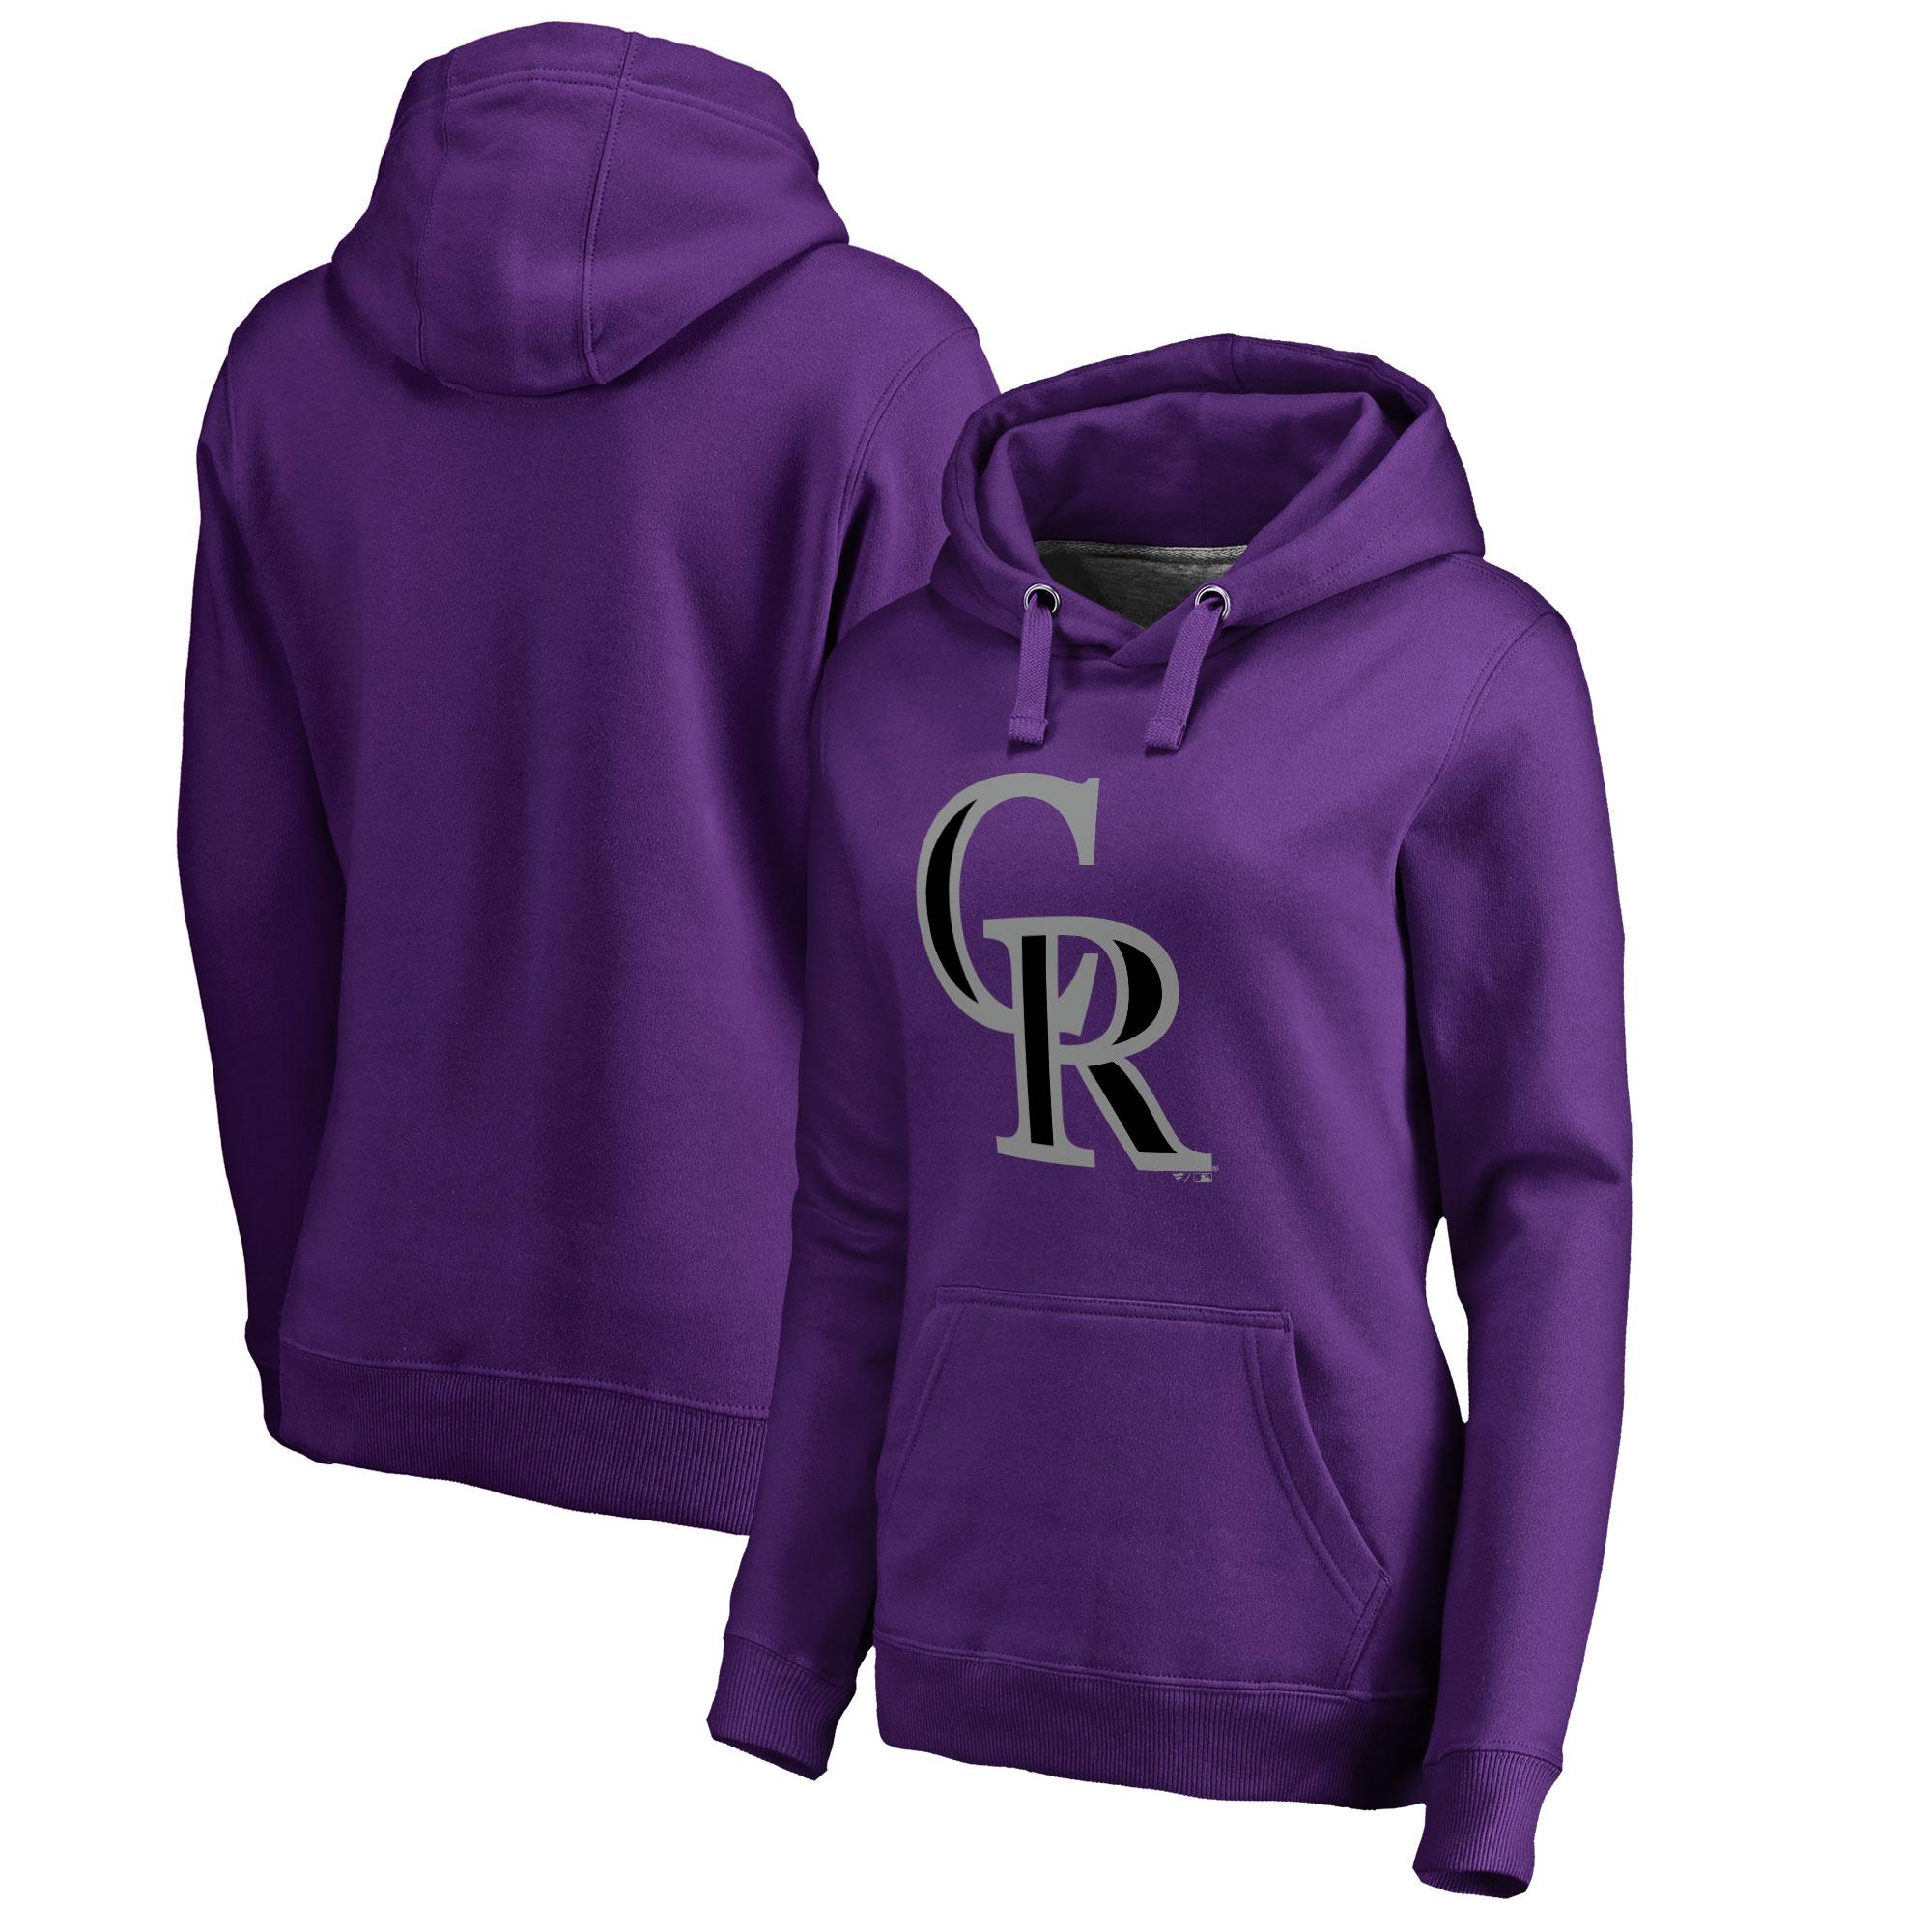 Colorado Rockies Women's Plus Sizes Primary Team Logo Pullover Hoodie - Purple